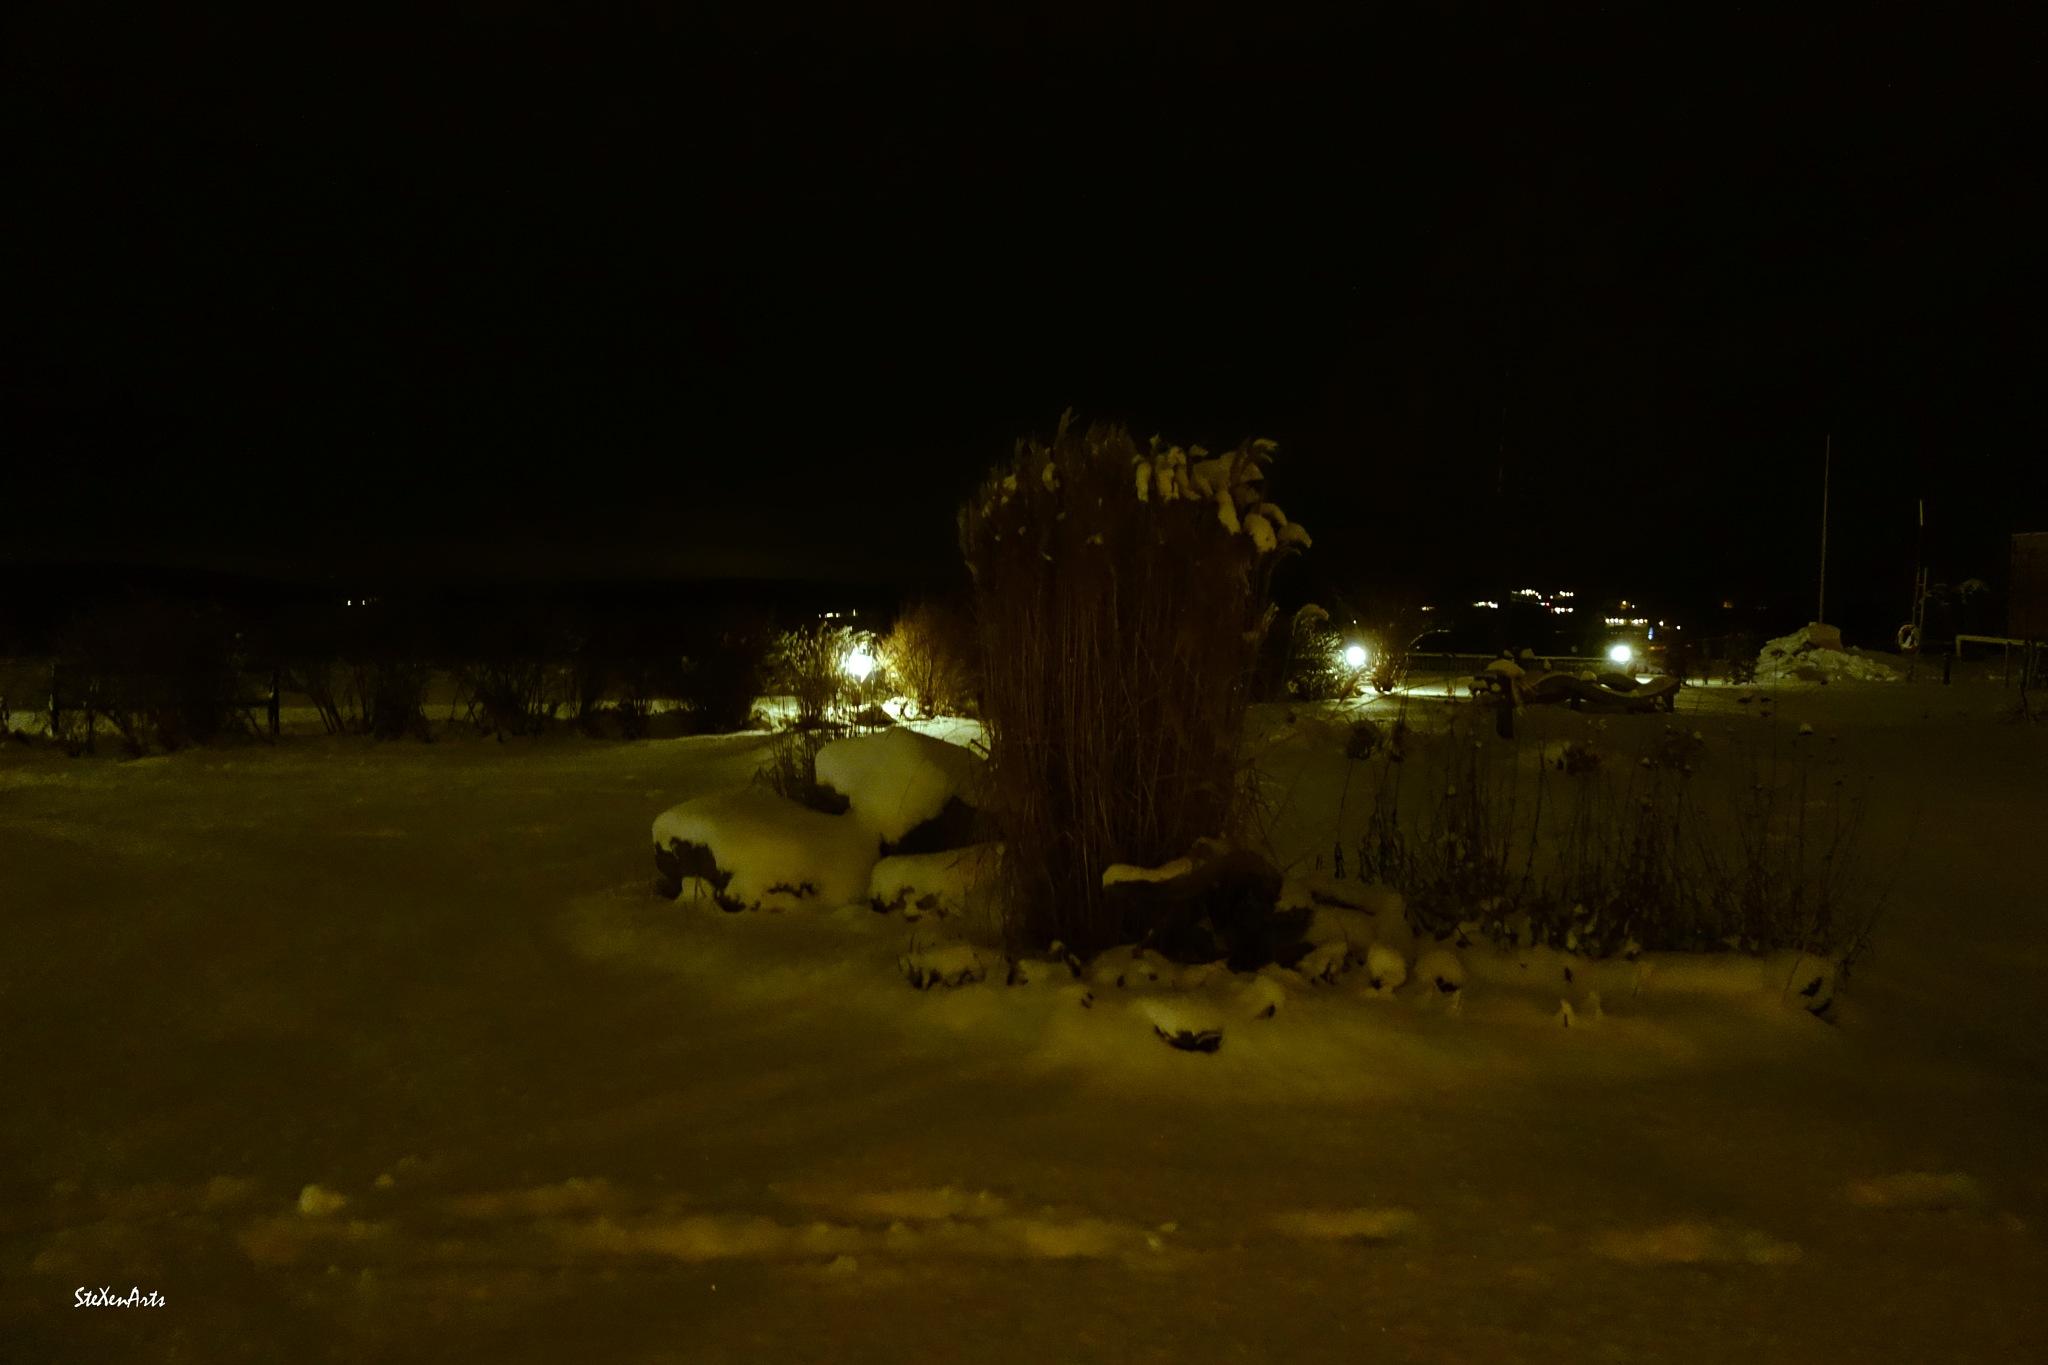 night in the park by Sanna & Stefan